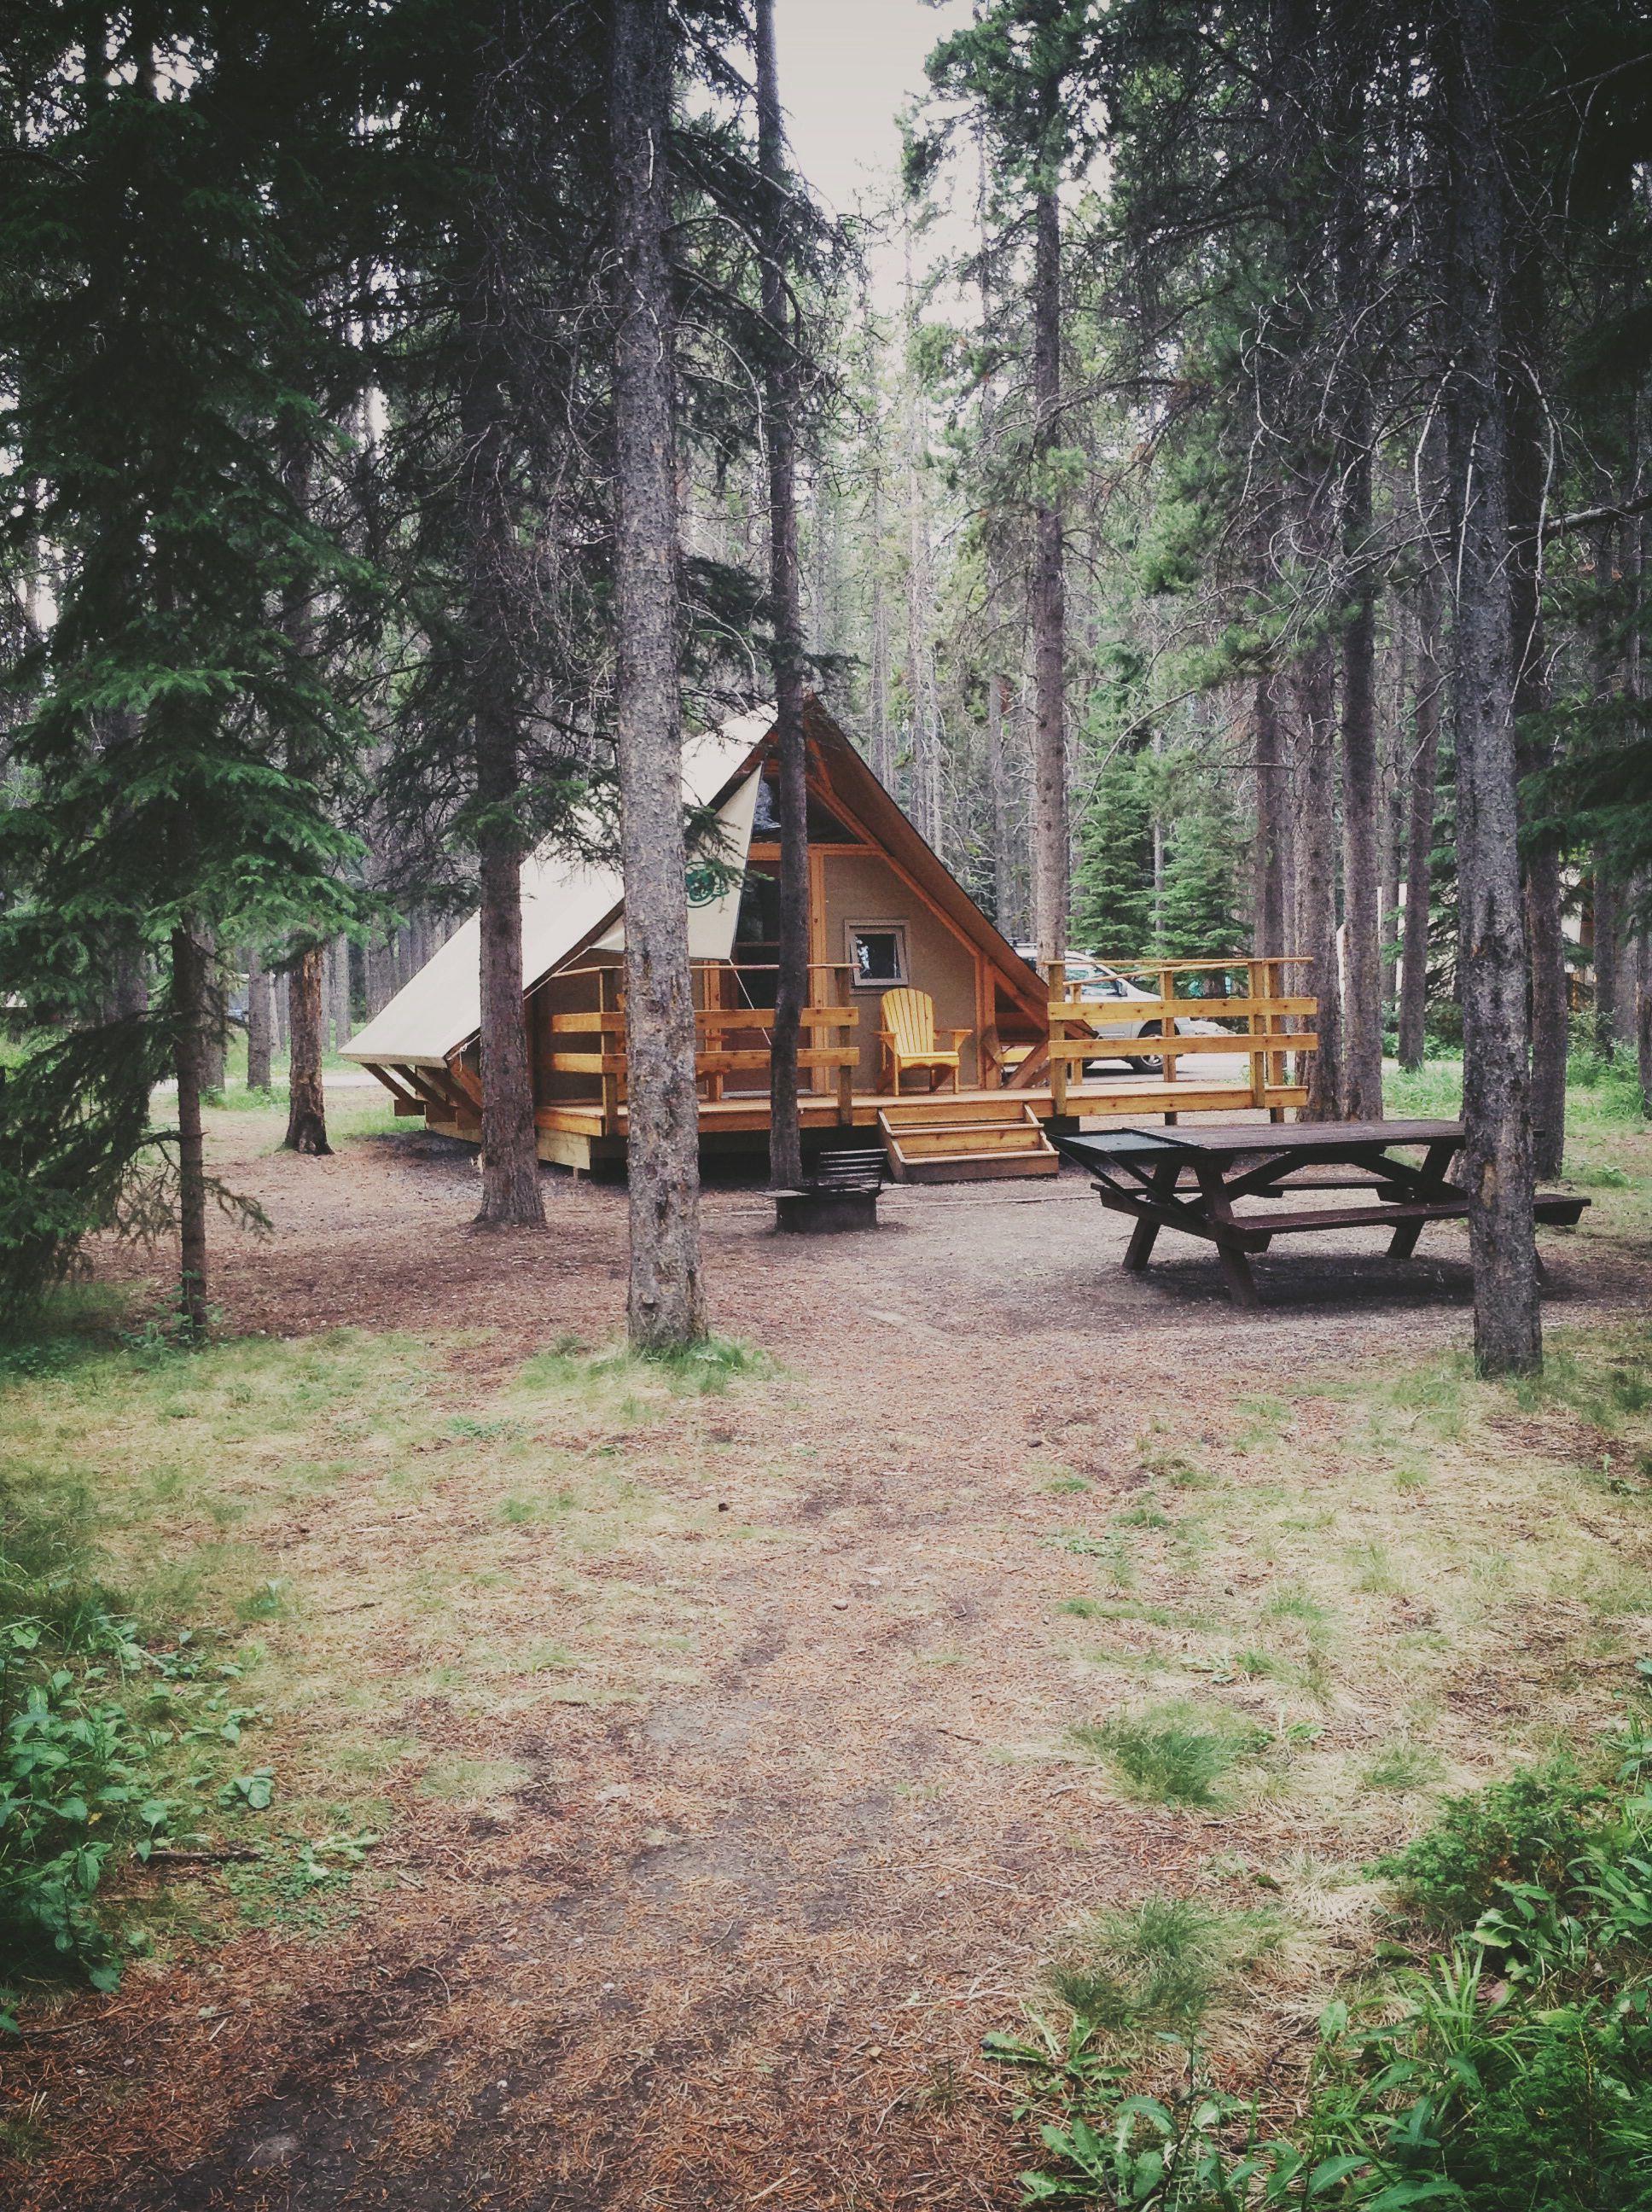 Otentik Campsite At Two Jack Lake Banff Colorado Homes Lake House Timber House